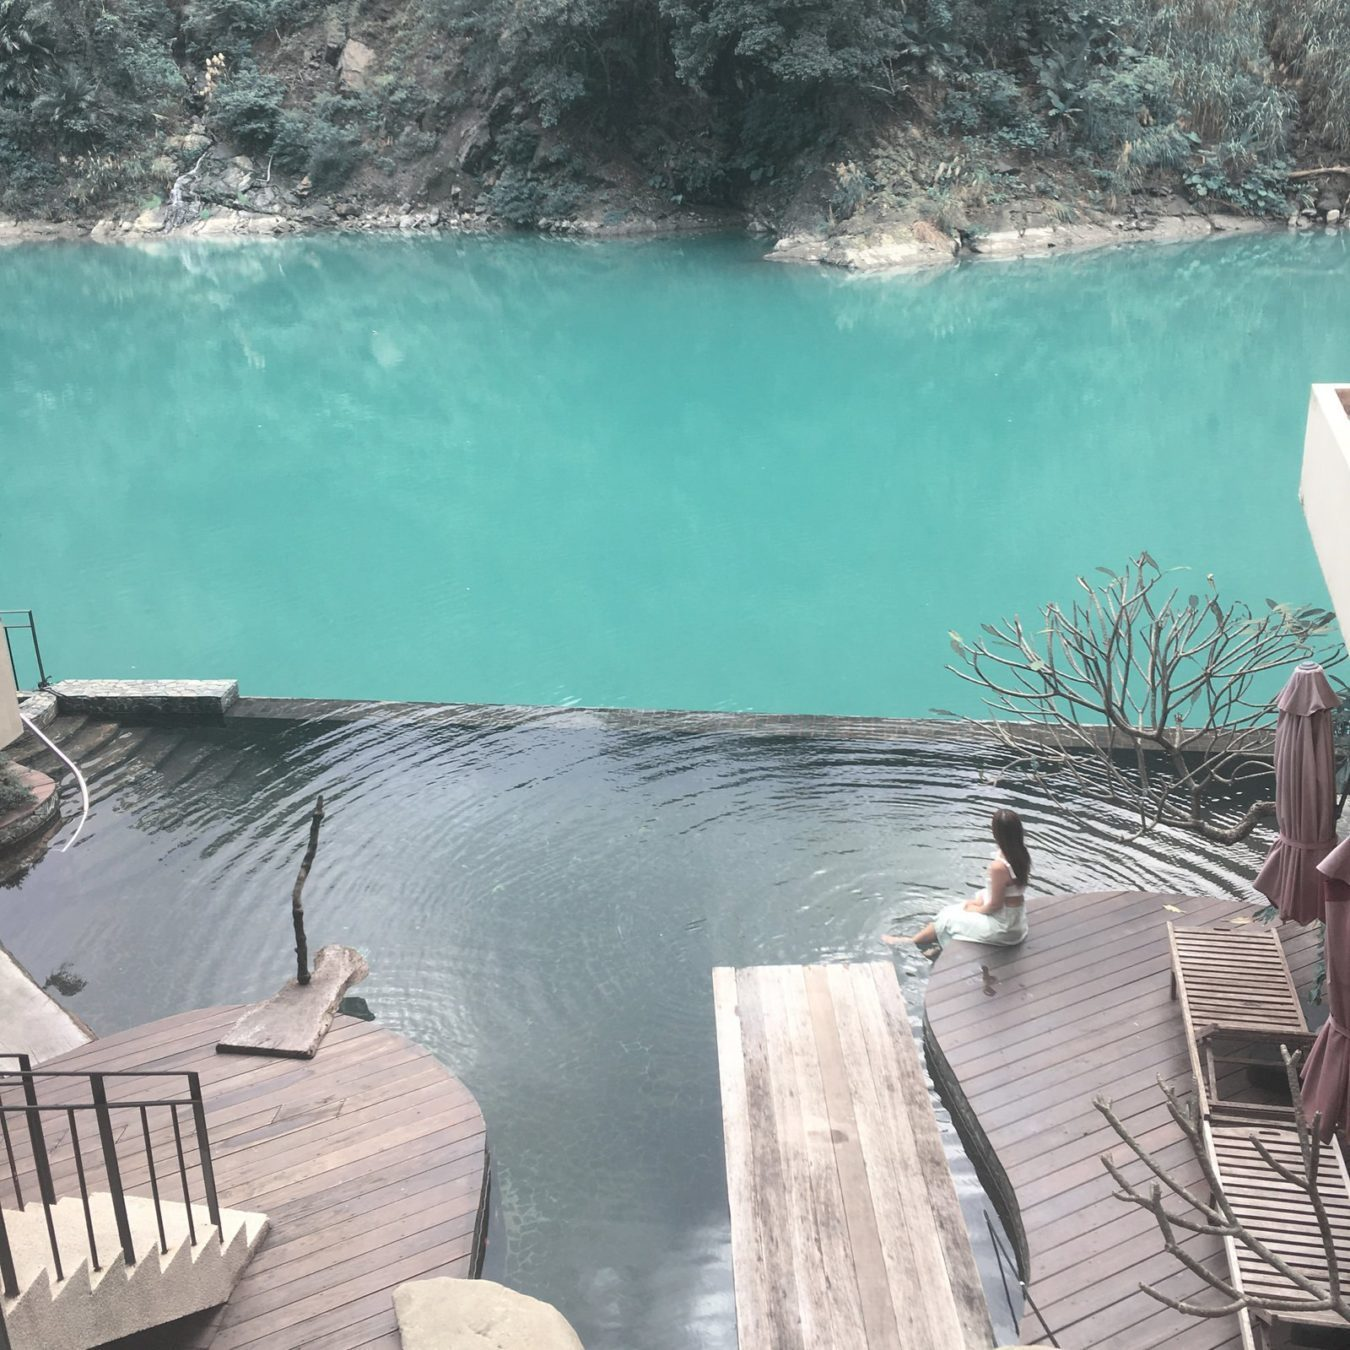 Volando Urai Spring in Wulai